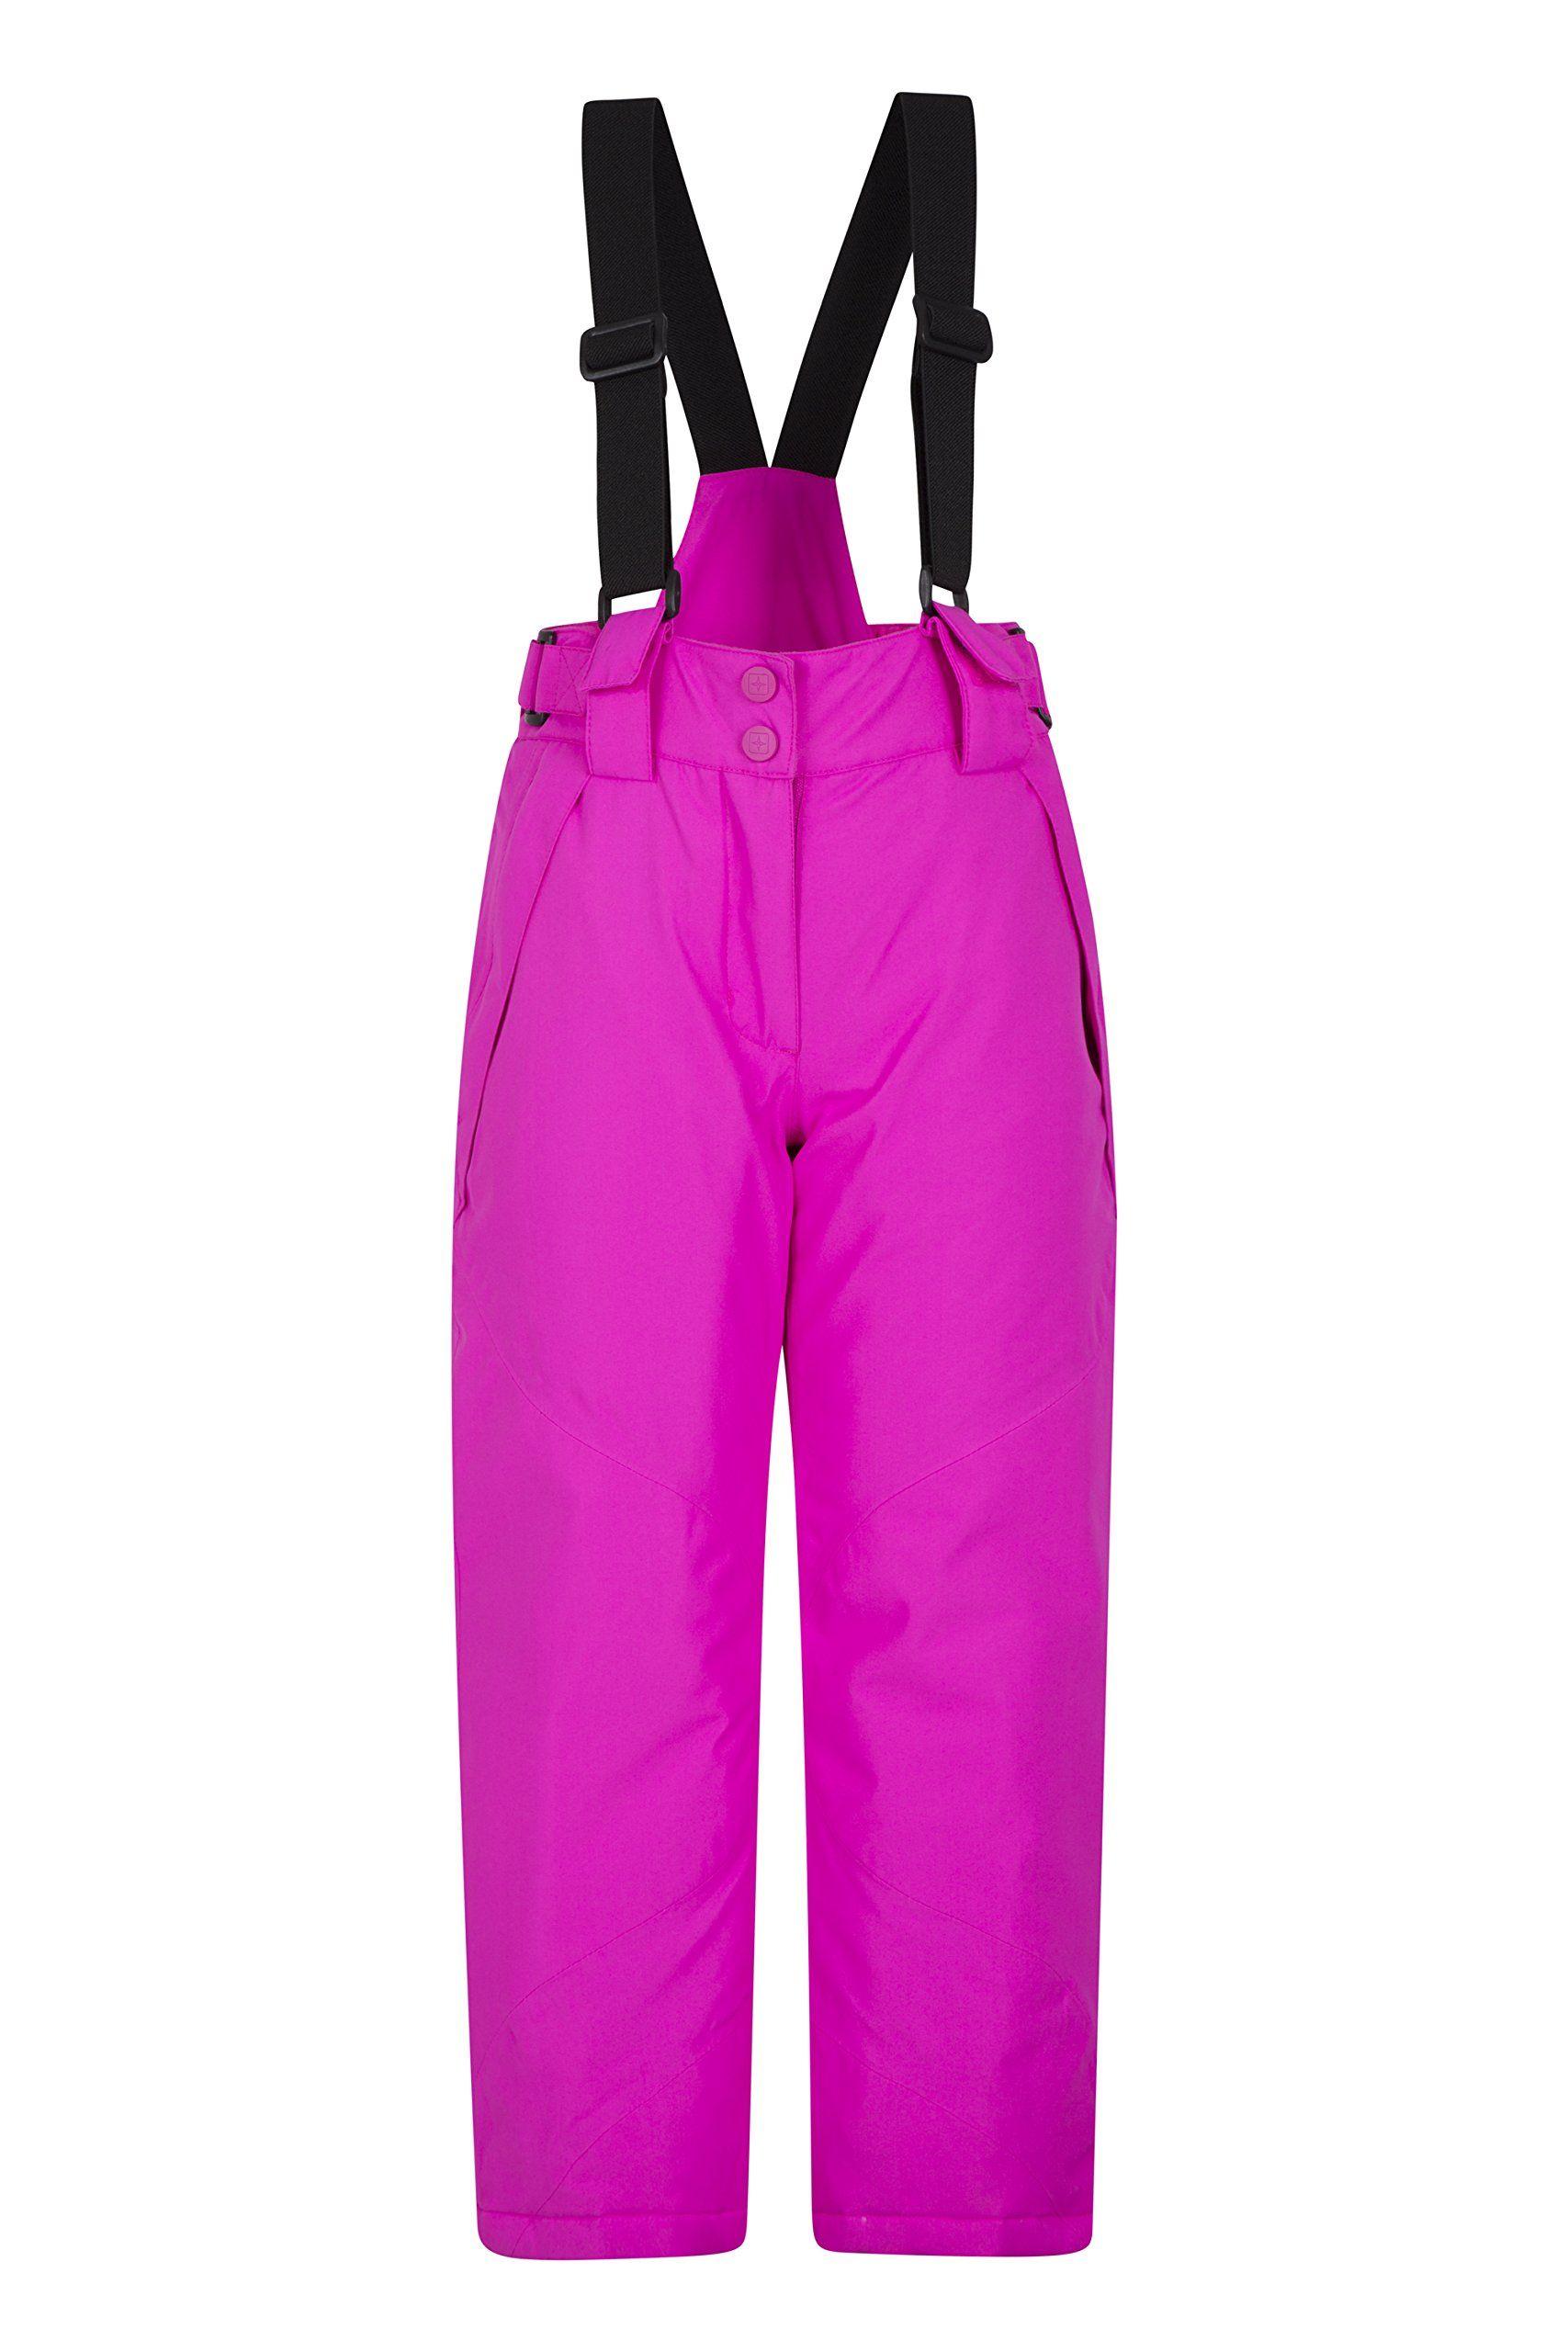 84d00c995b04 Mountain Warehouse Falcon Extreme Kids Ski Pants Bright Pink 11-12 ...